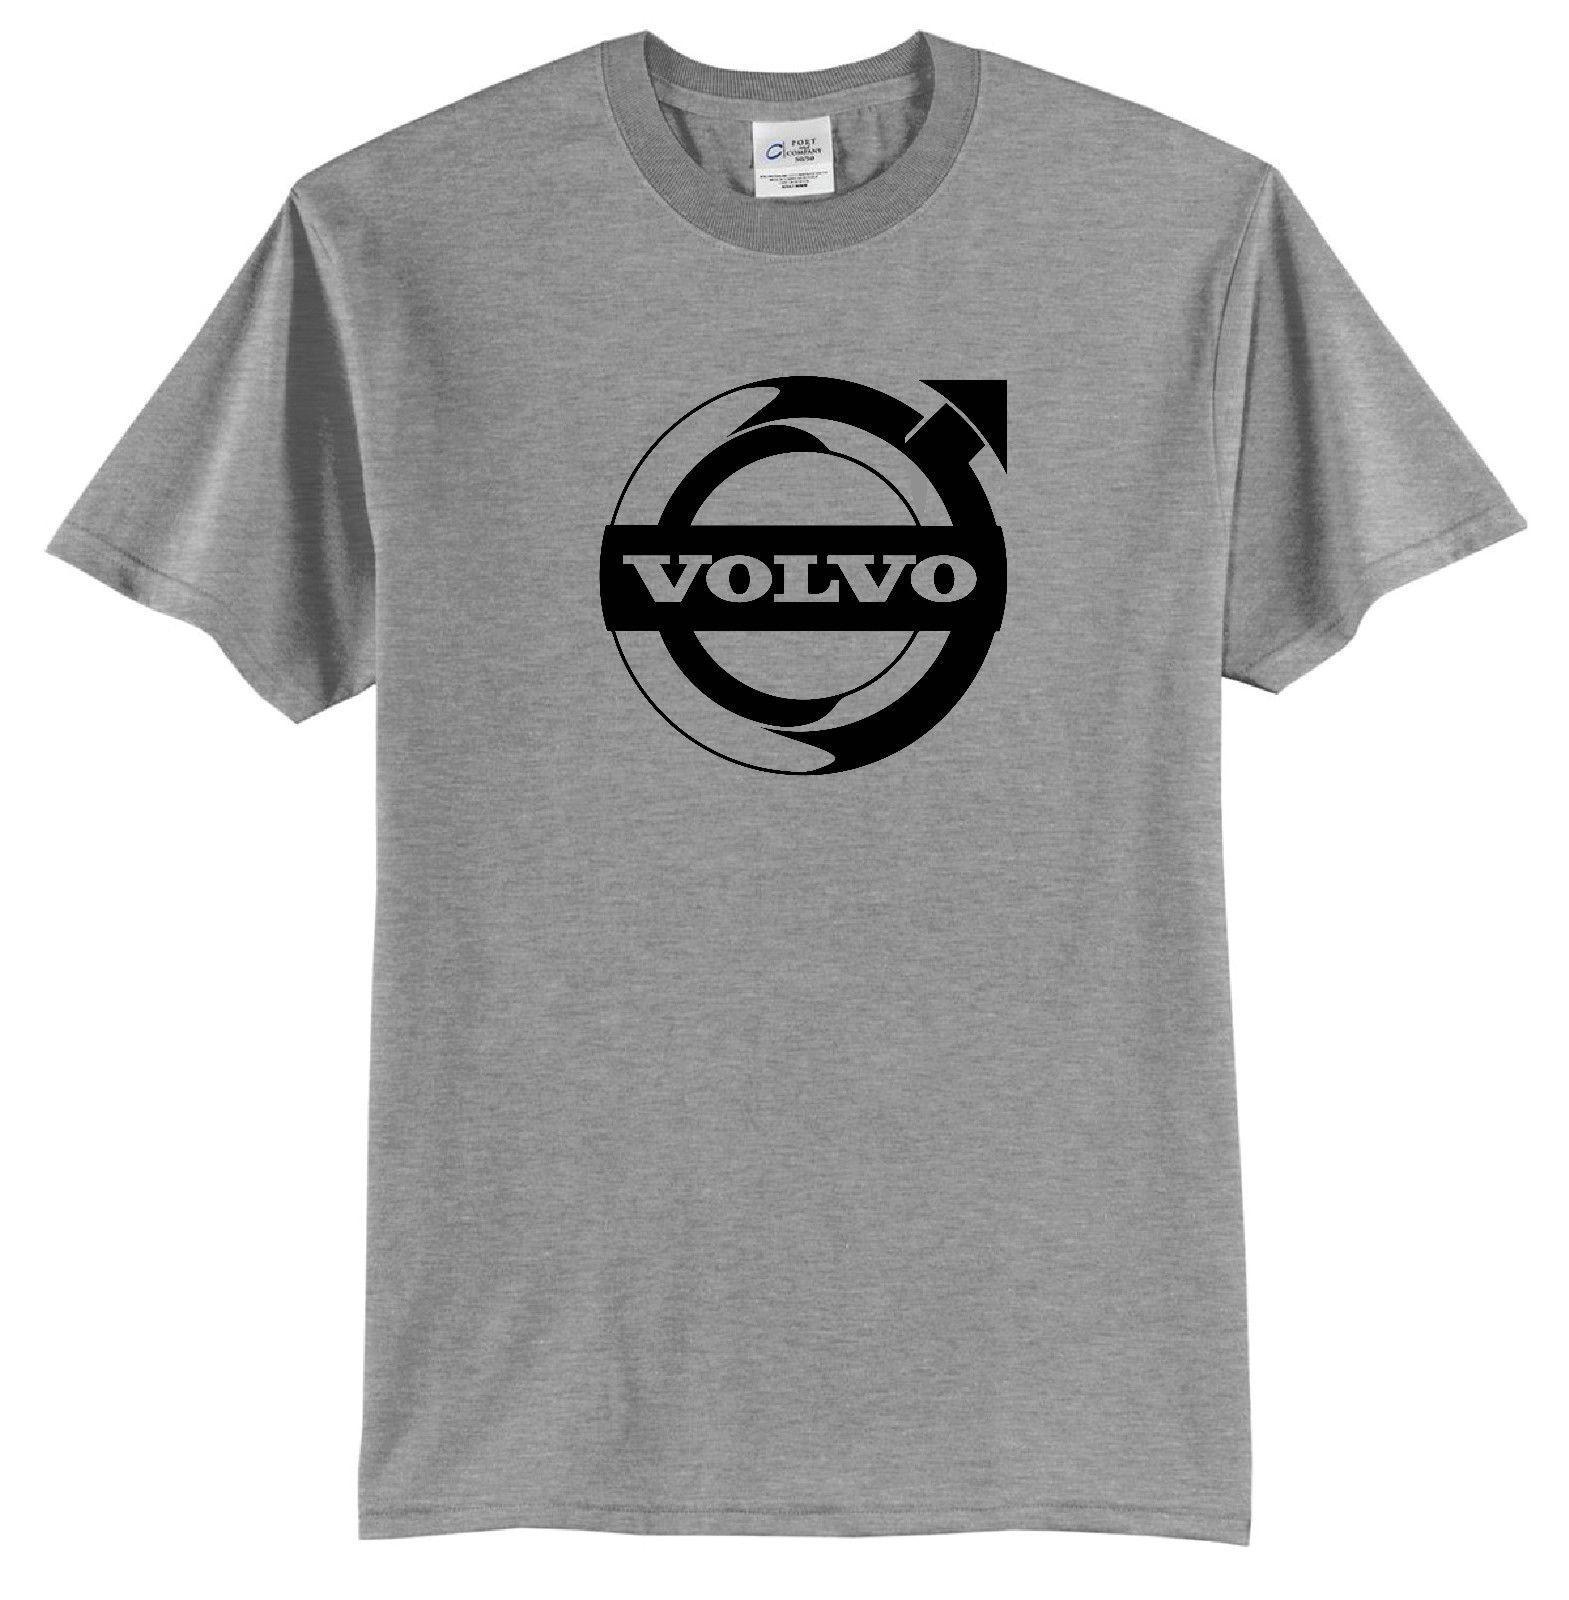 Details Zu Volvo Custom Logo T Shirt Sweden Racing Motors Cars 18 Wheeler  Freight Truckers Funny Unisex Tee Cool Looking T Shirts Buy Designer Shirts  From ... 764b5fe72065